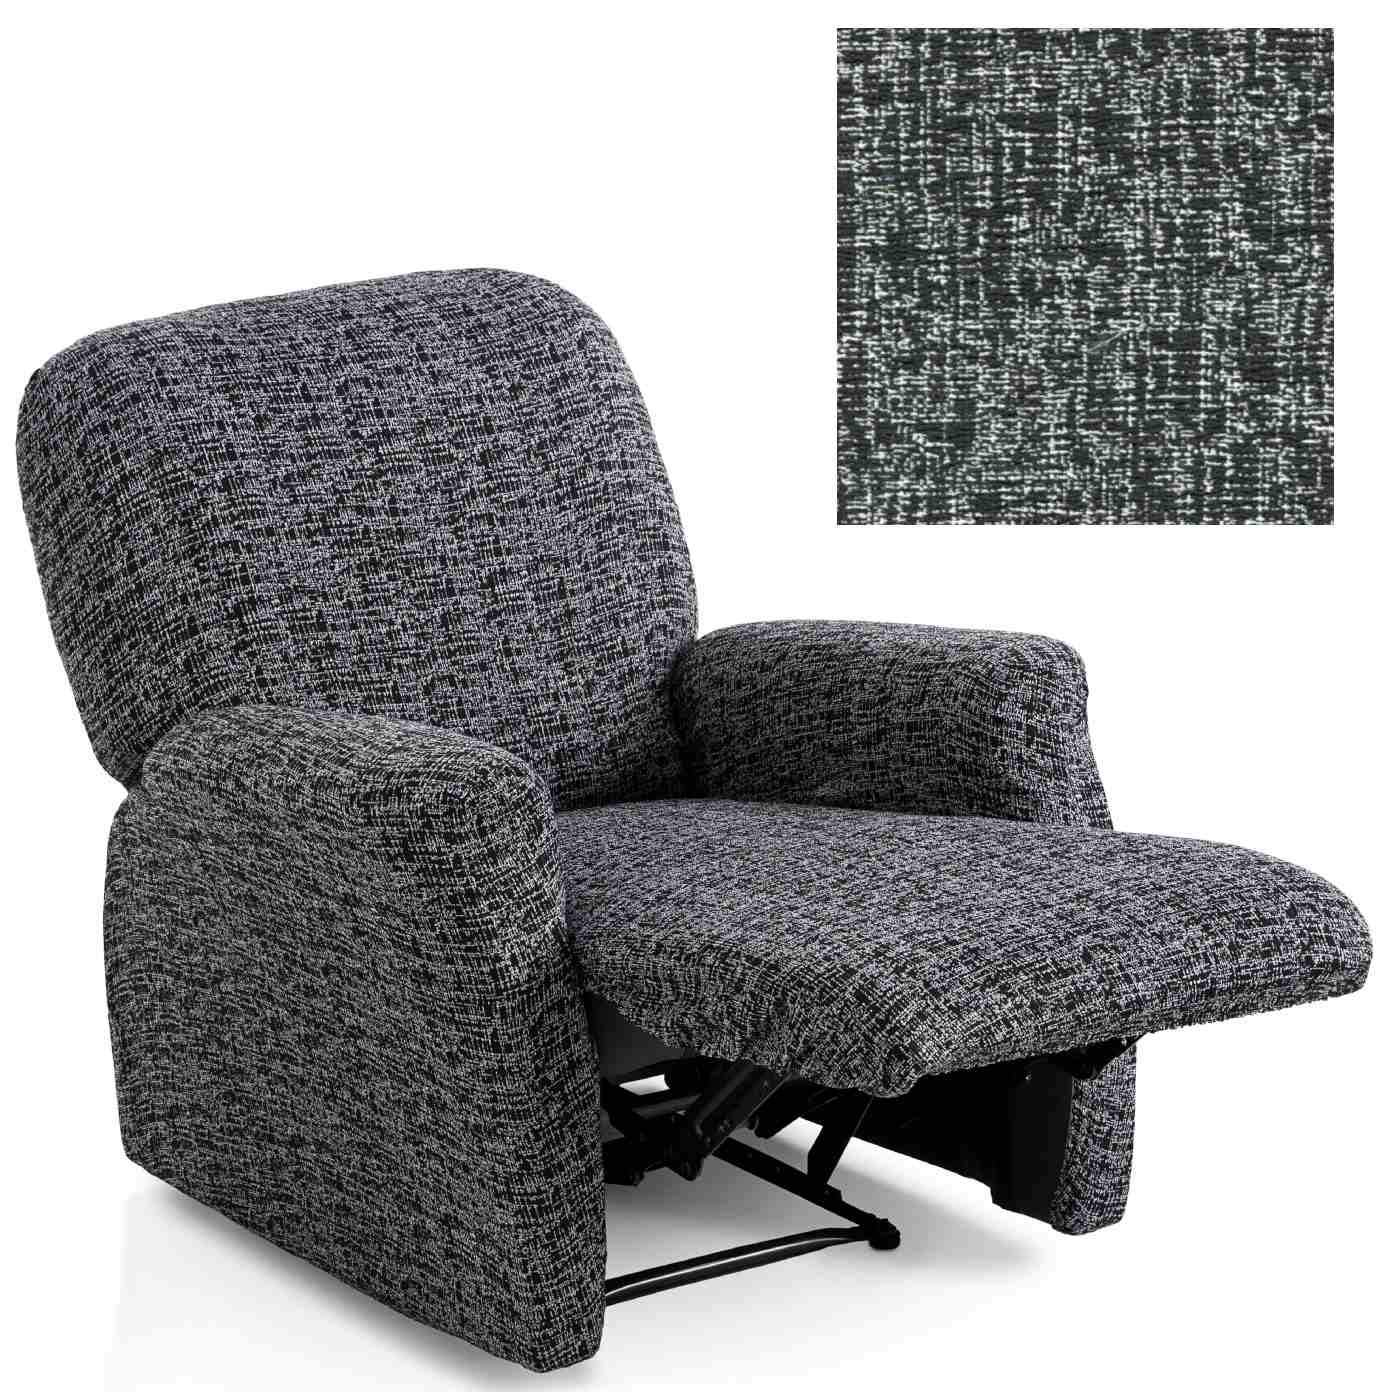 Jarrous Funda de Sillón Relax Completo Elástica Modelo Gozo, Color Negro-11, Medida 60-80cm Respaldo